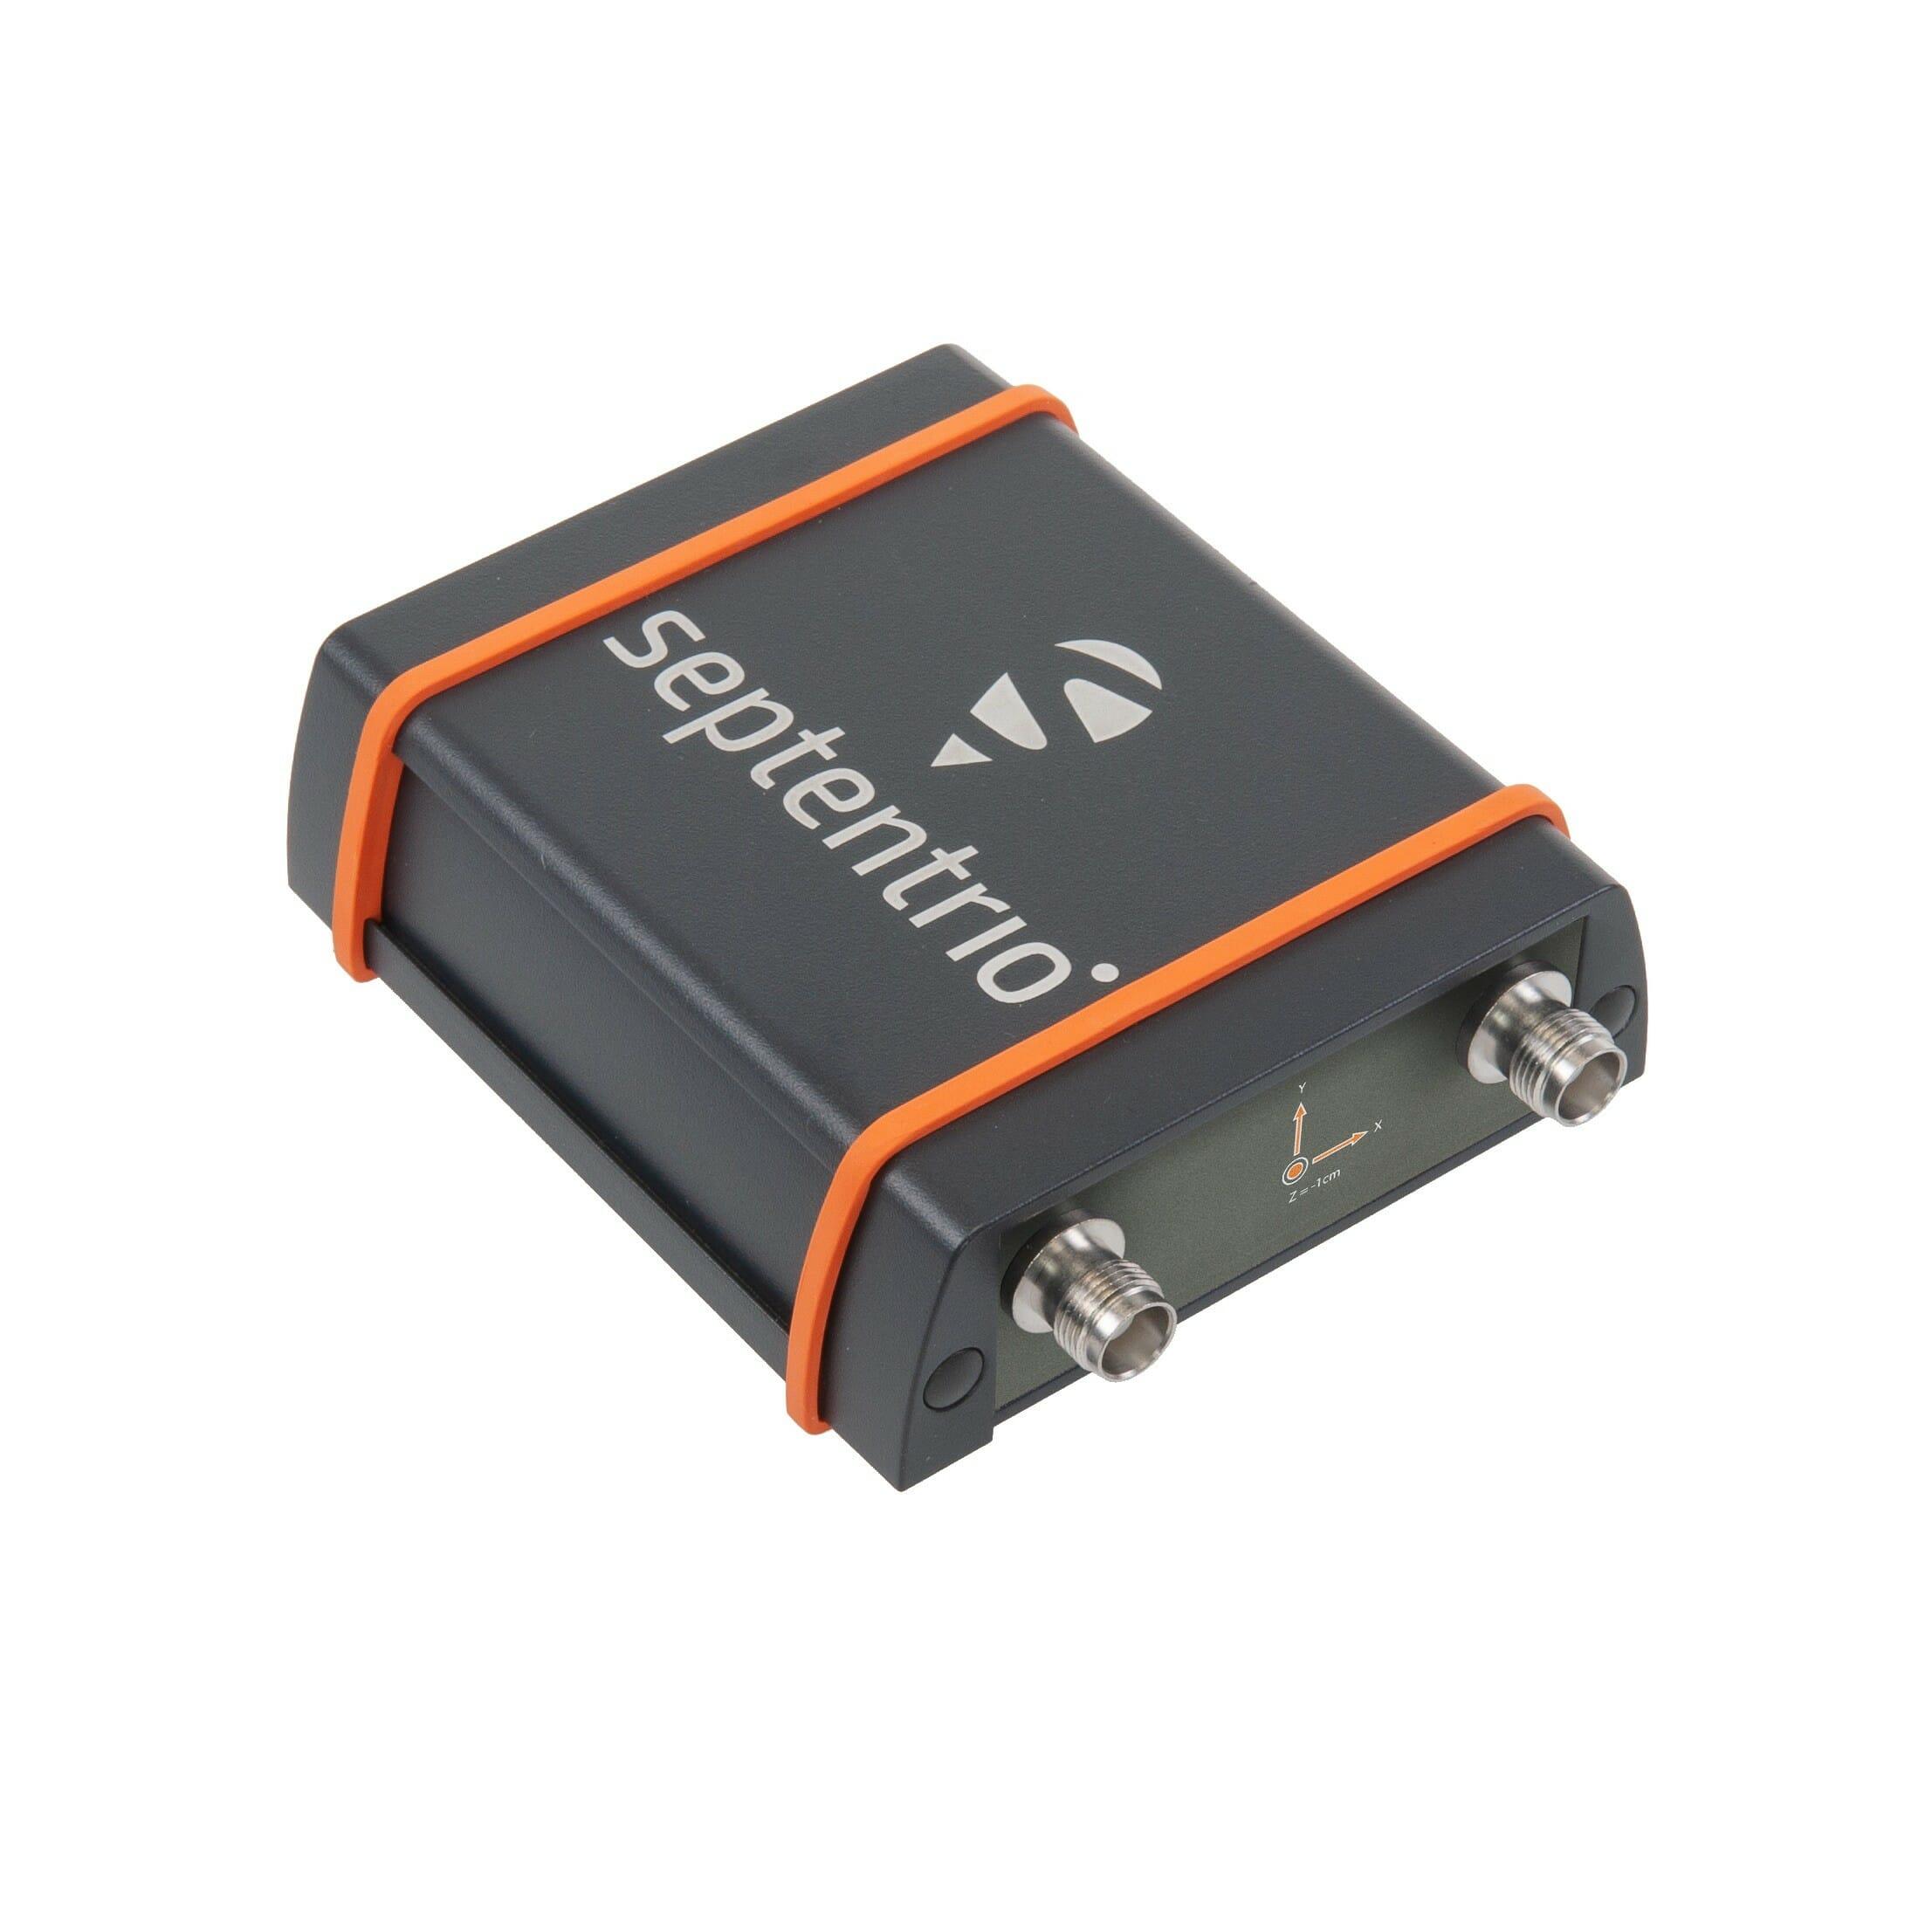 Septentrio AsteRx-SBi GNSS INS receiver